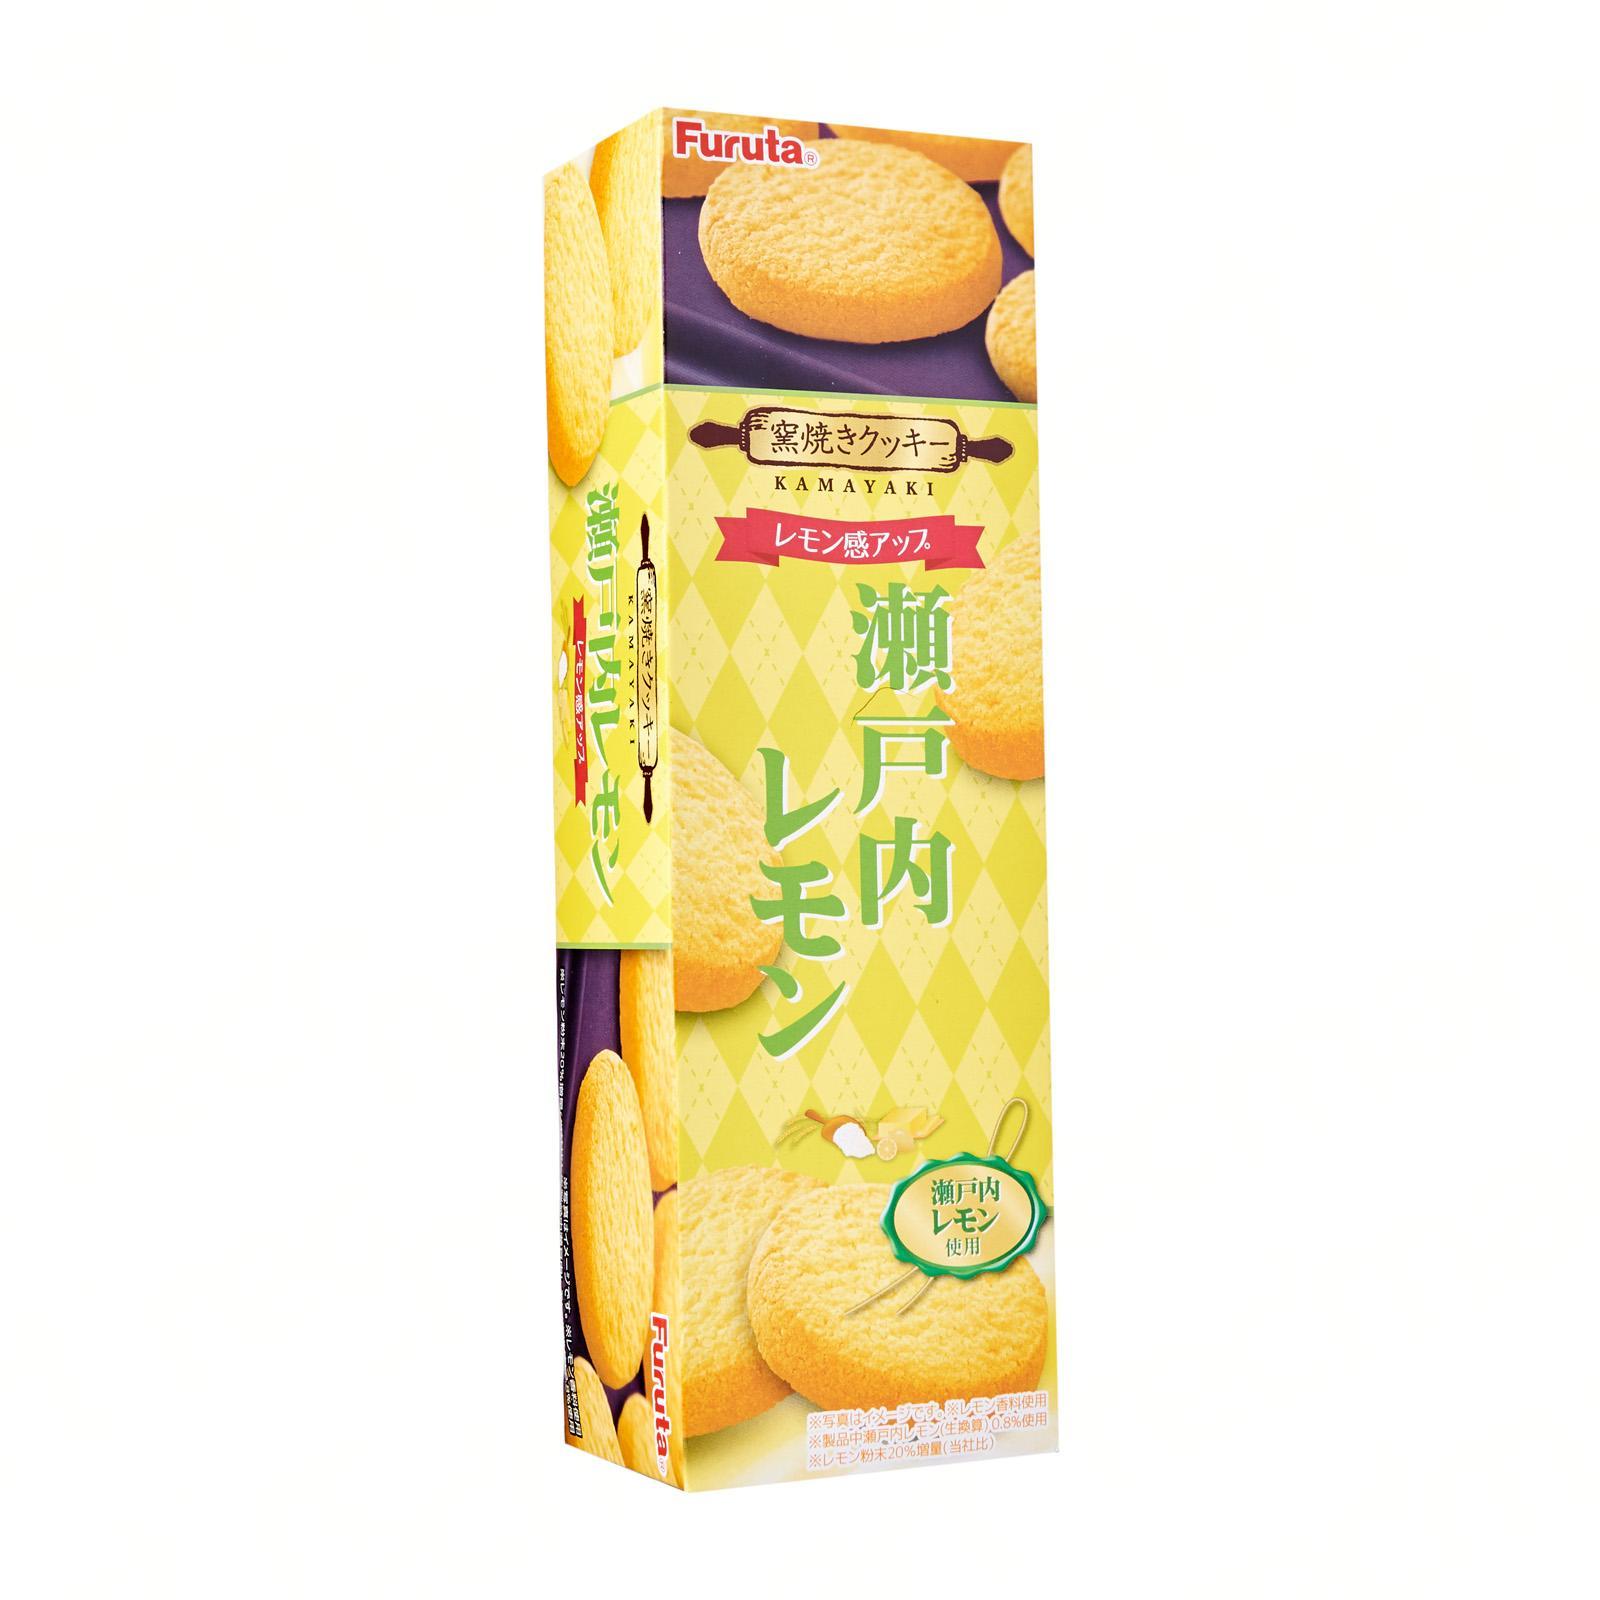 Kirei Furata - Japan Setouchi Lemon Cookies Snack 80.4G